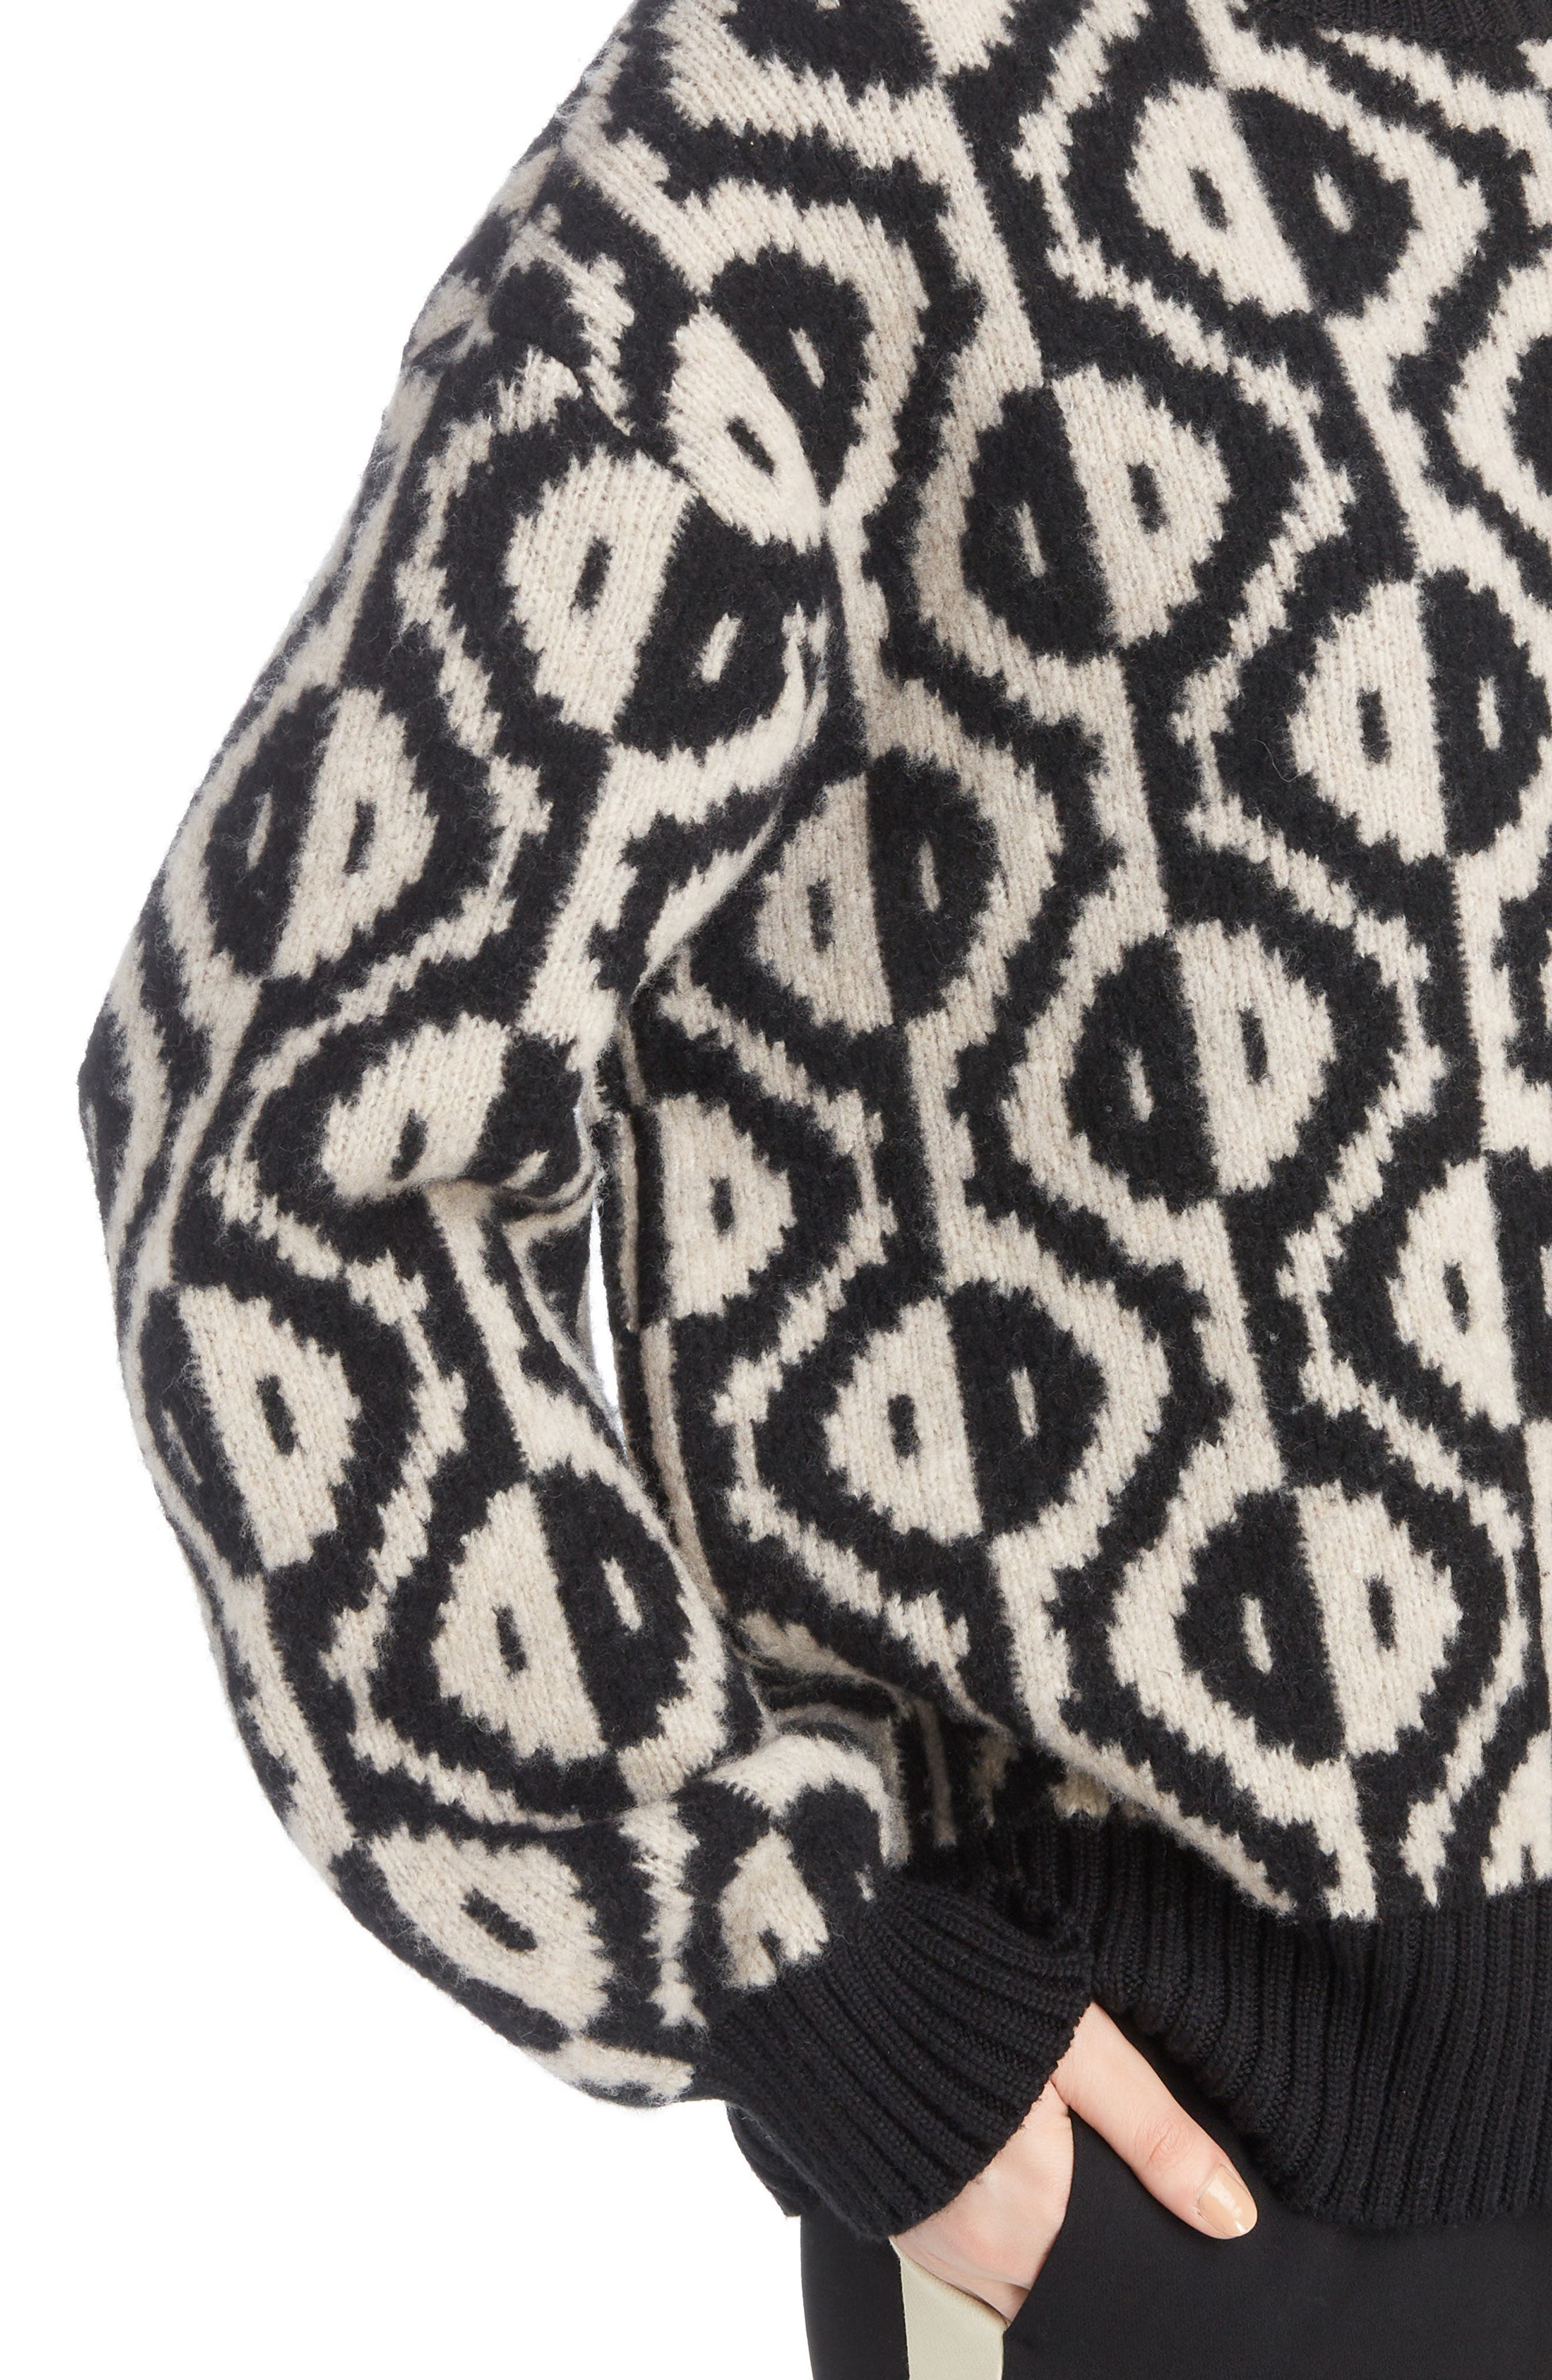 Geo Jacquard Merino Wool Blend Sweater,                             Alternate thumbnail 4, color,                             001